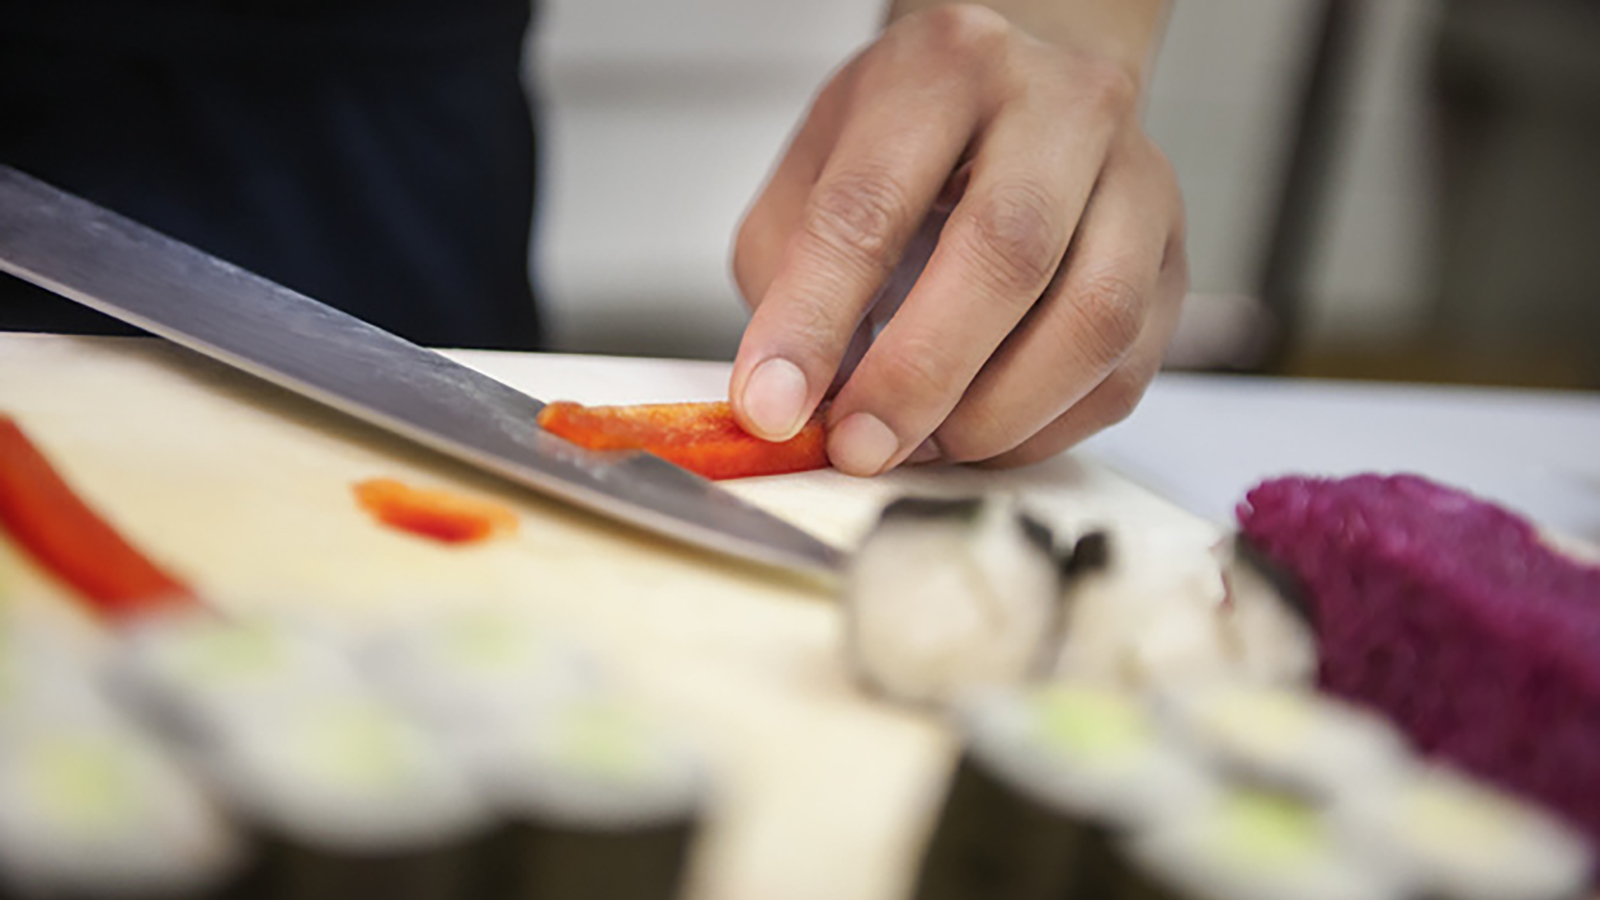 Sushi Kochkurs in Leipzig - Erlebnisfabrik